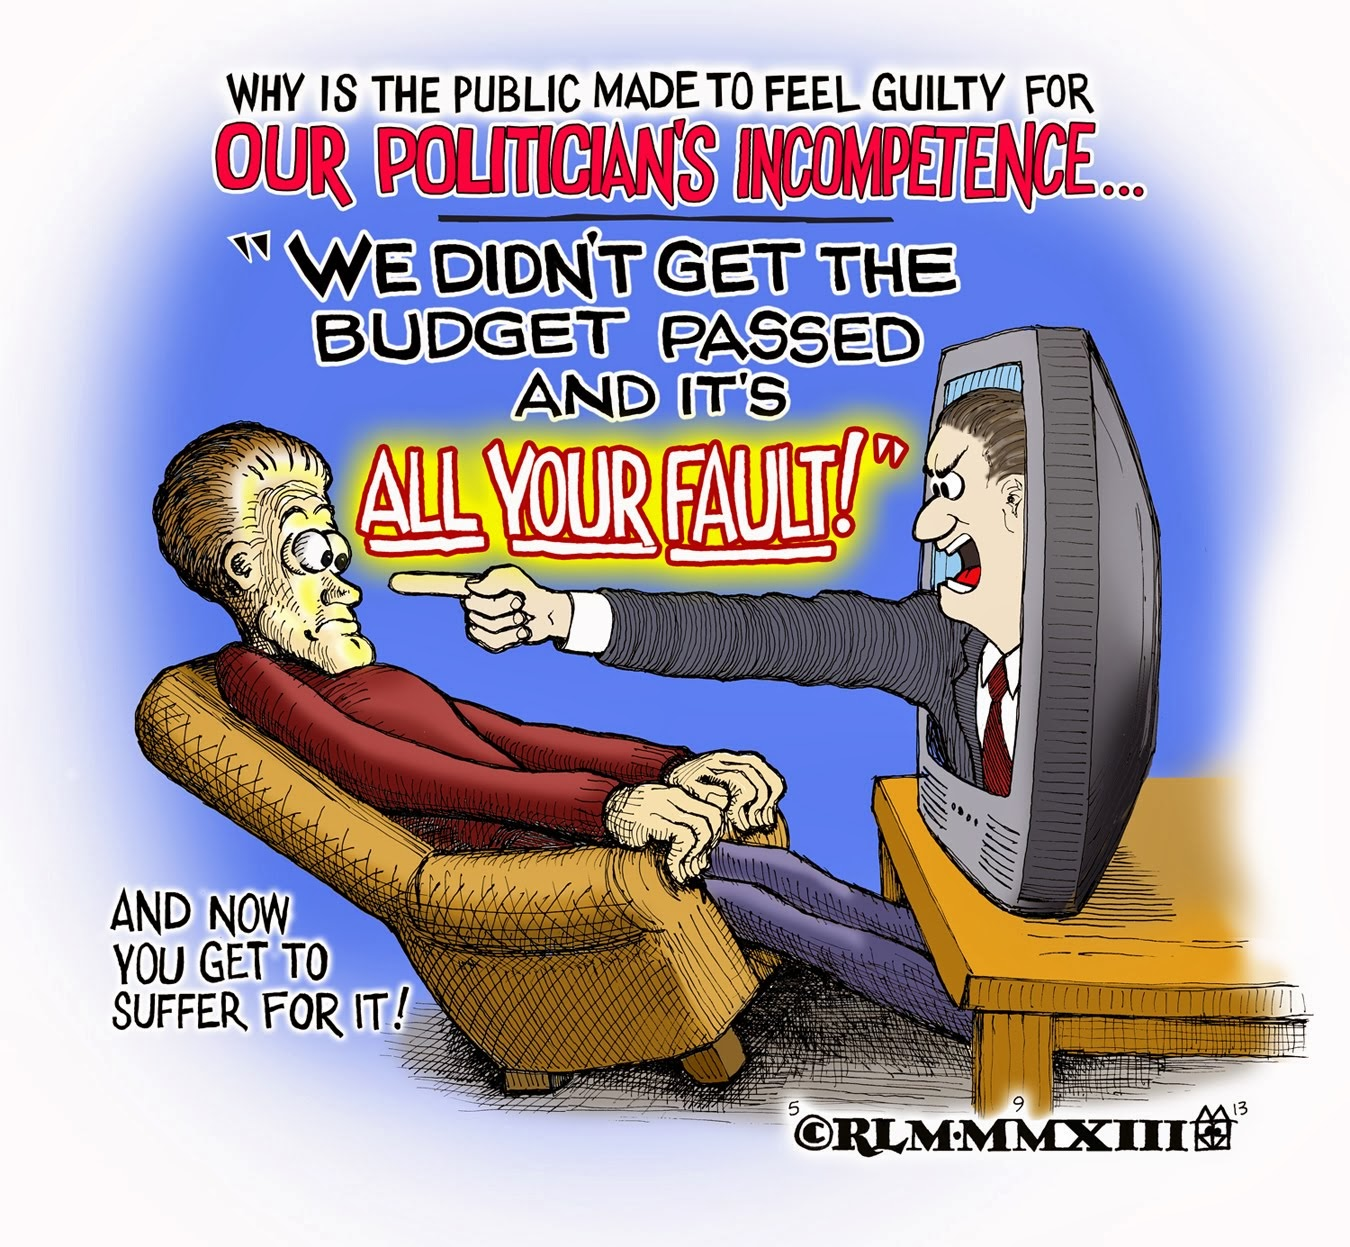 IT'S YOUR FAULT !!